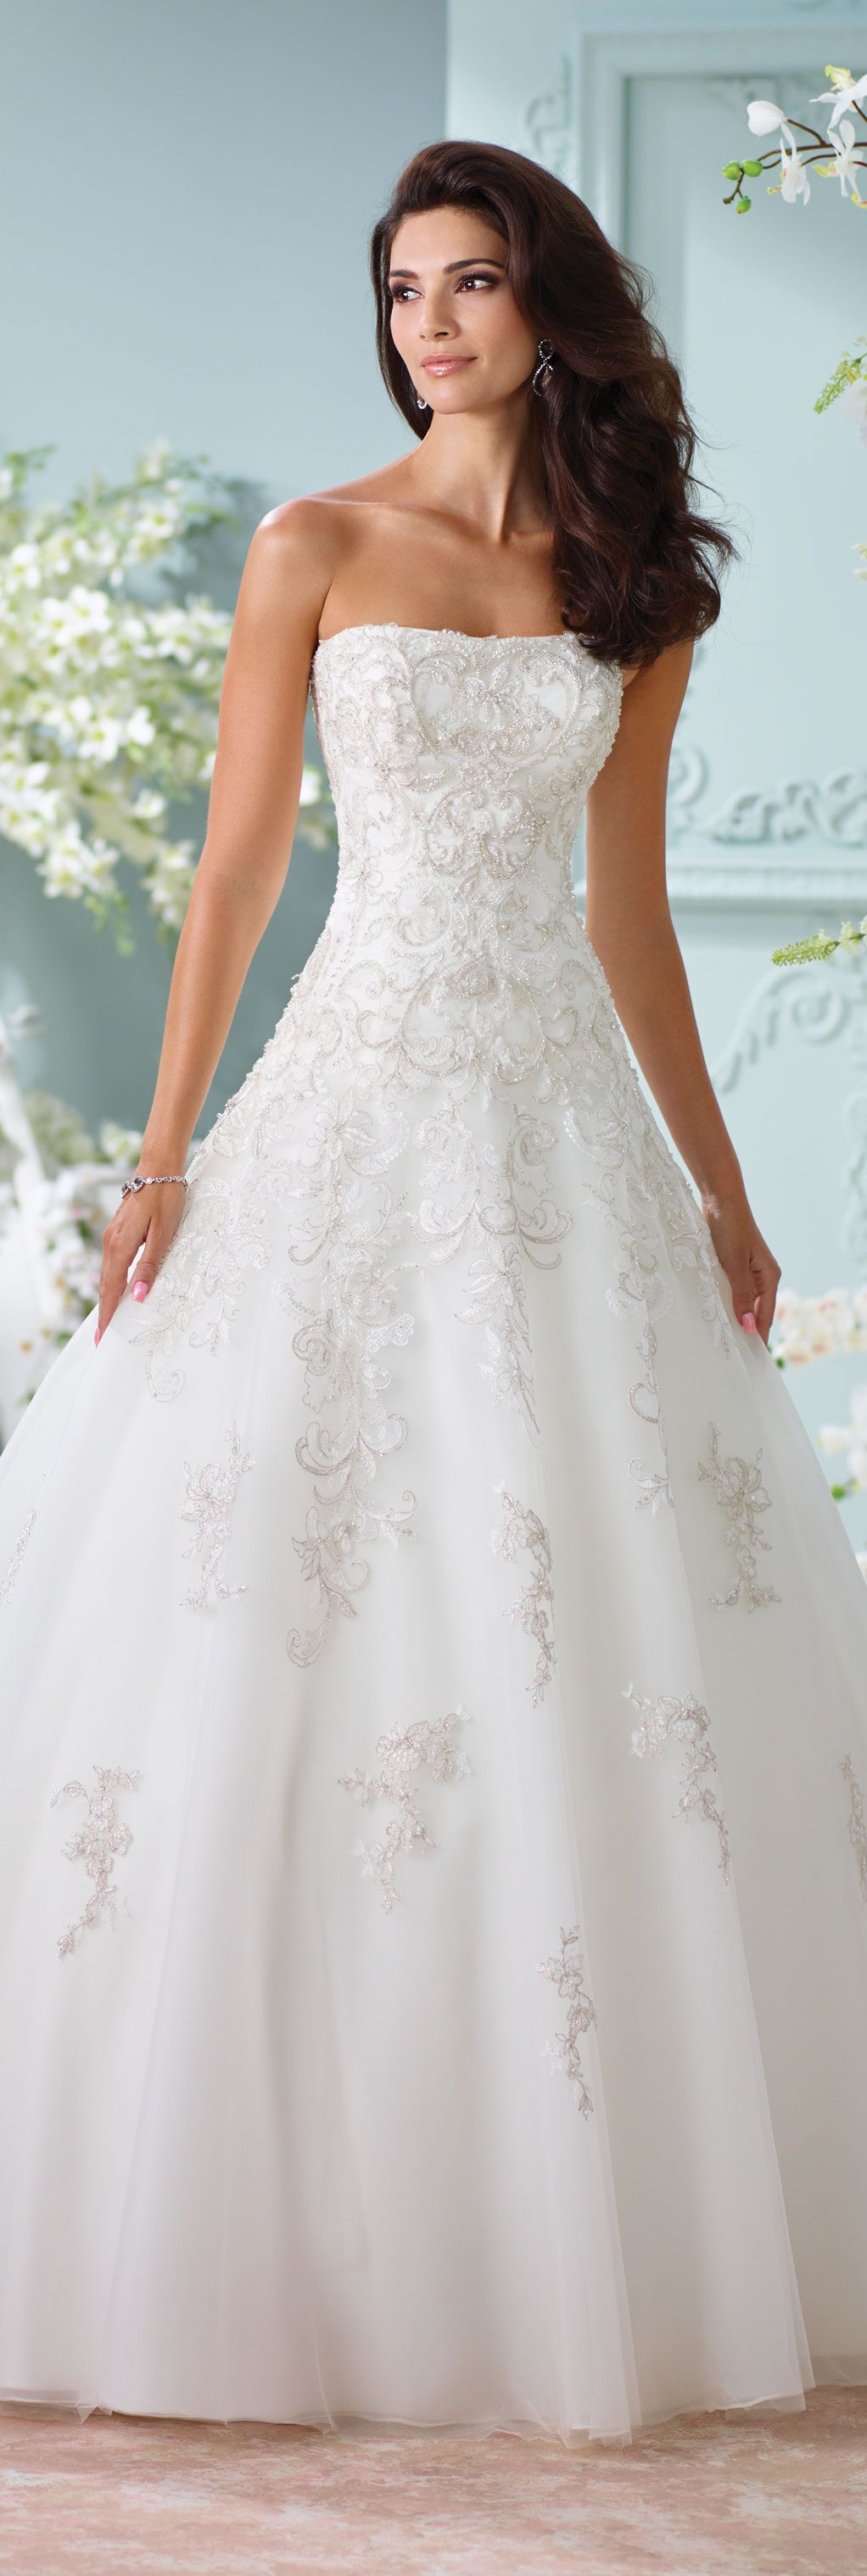 Strapless Hand-Beaded Lace & Tulle Wedding Dress- 116216 Sunniva ...